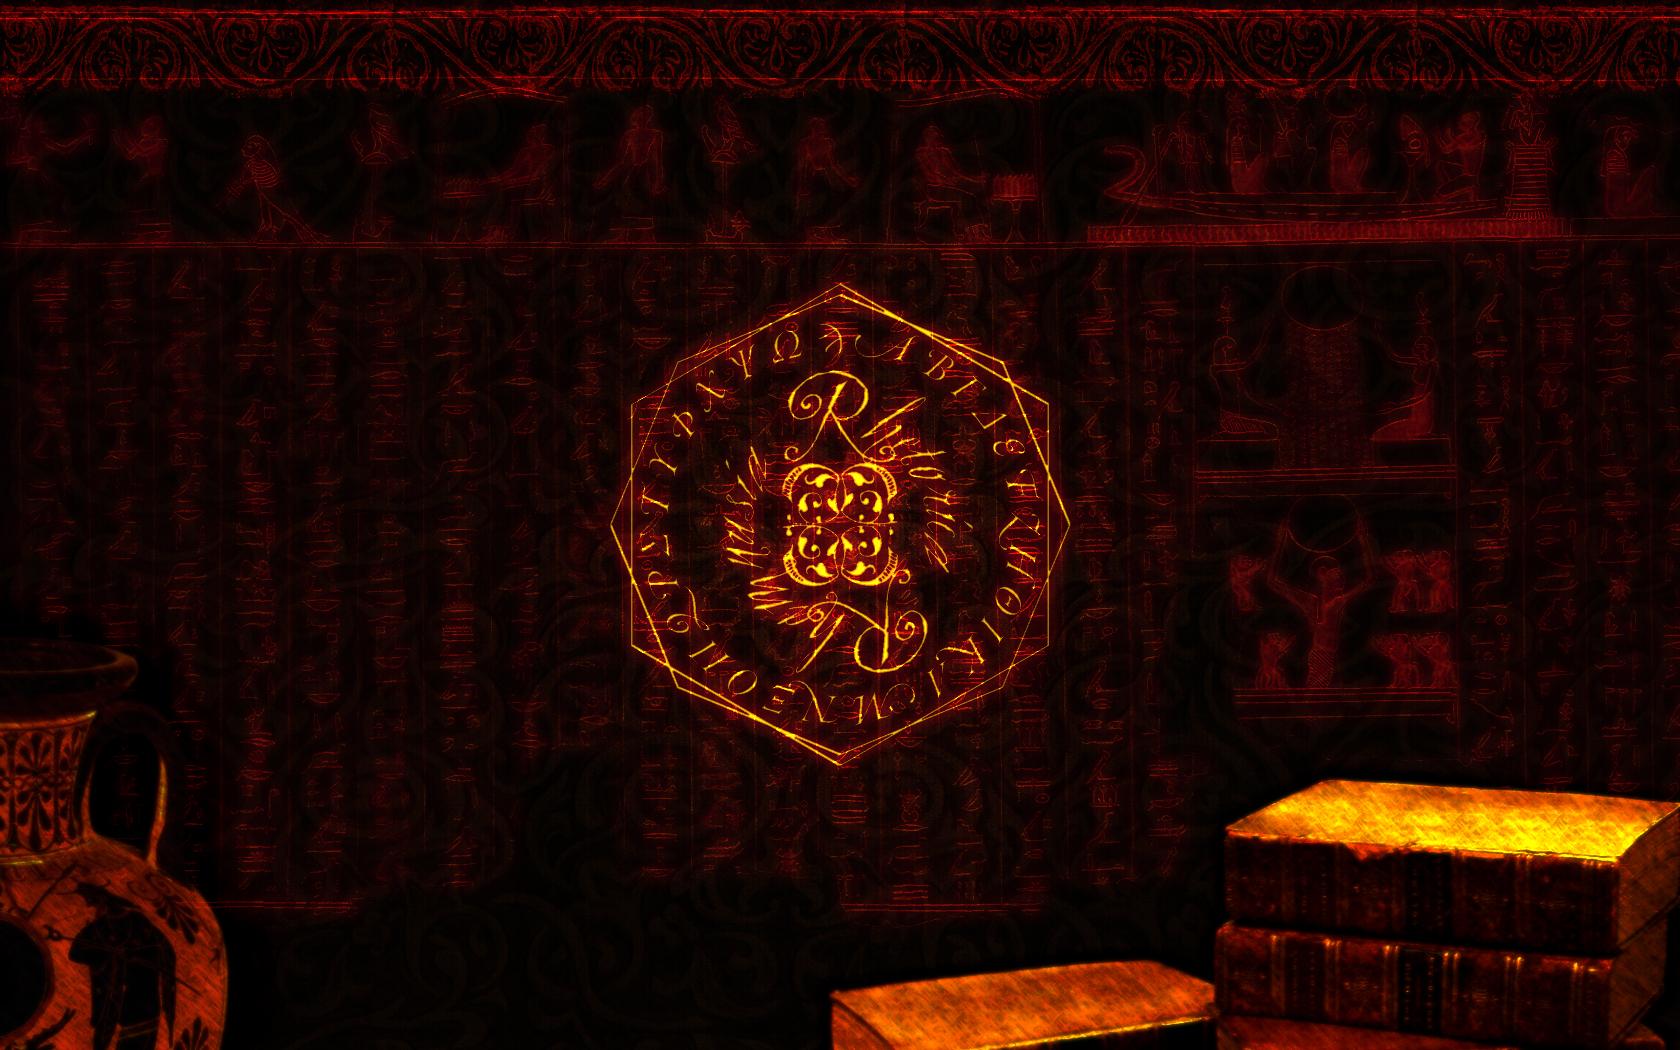 Seal of Rhetorica Rhamnusia by Samantha-Wright